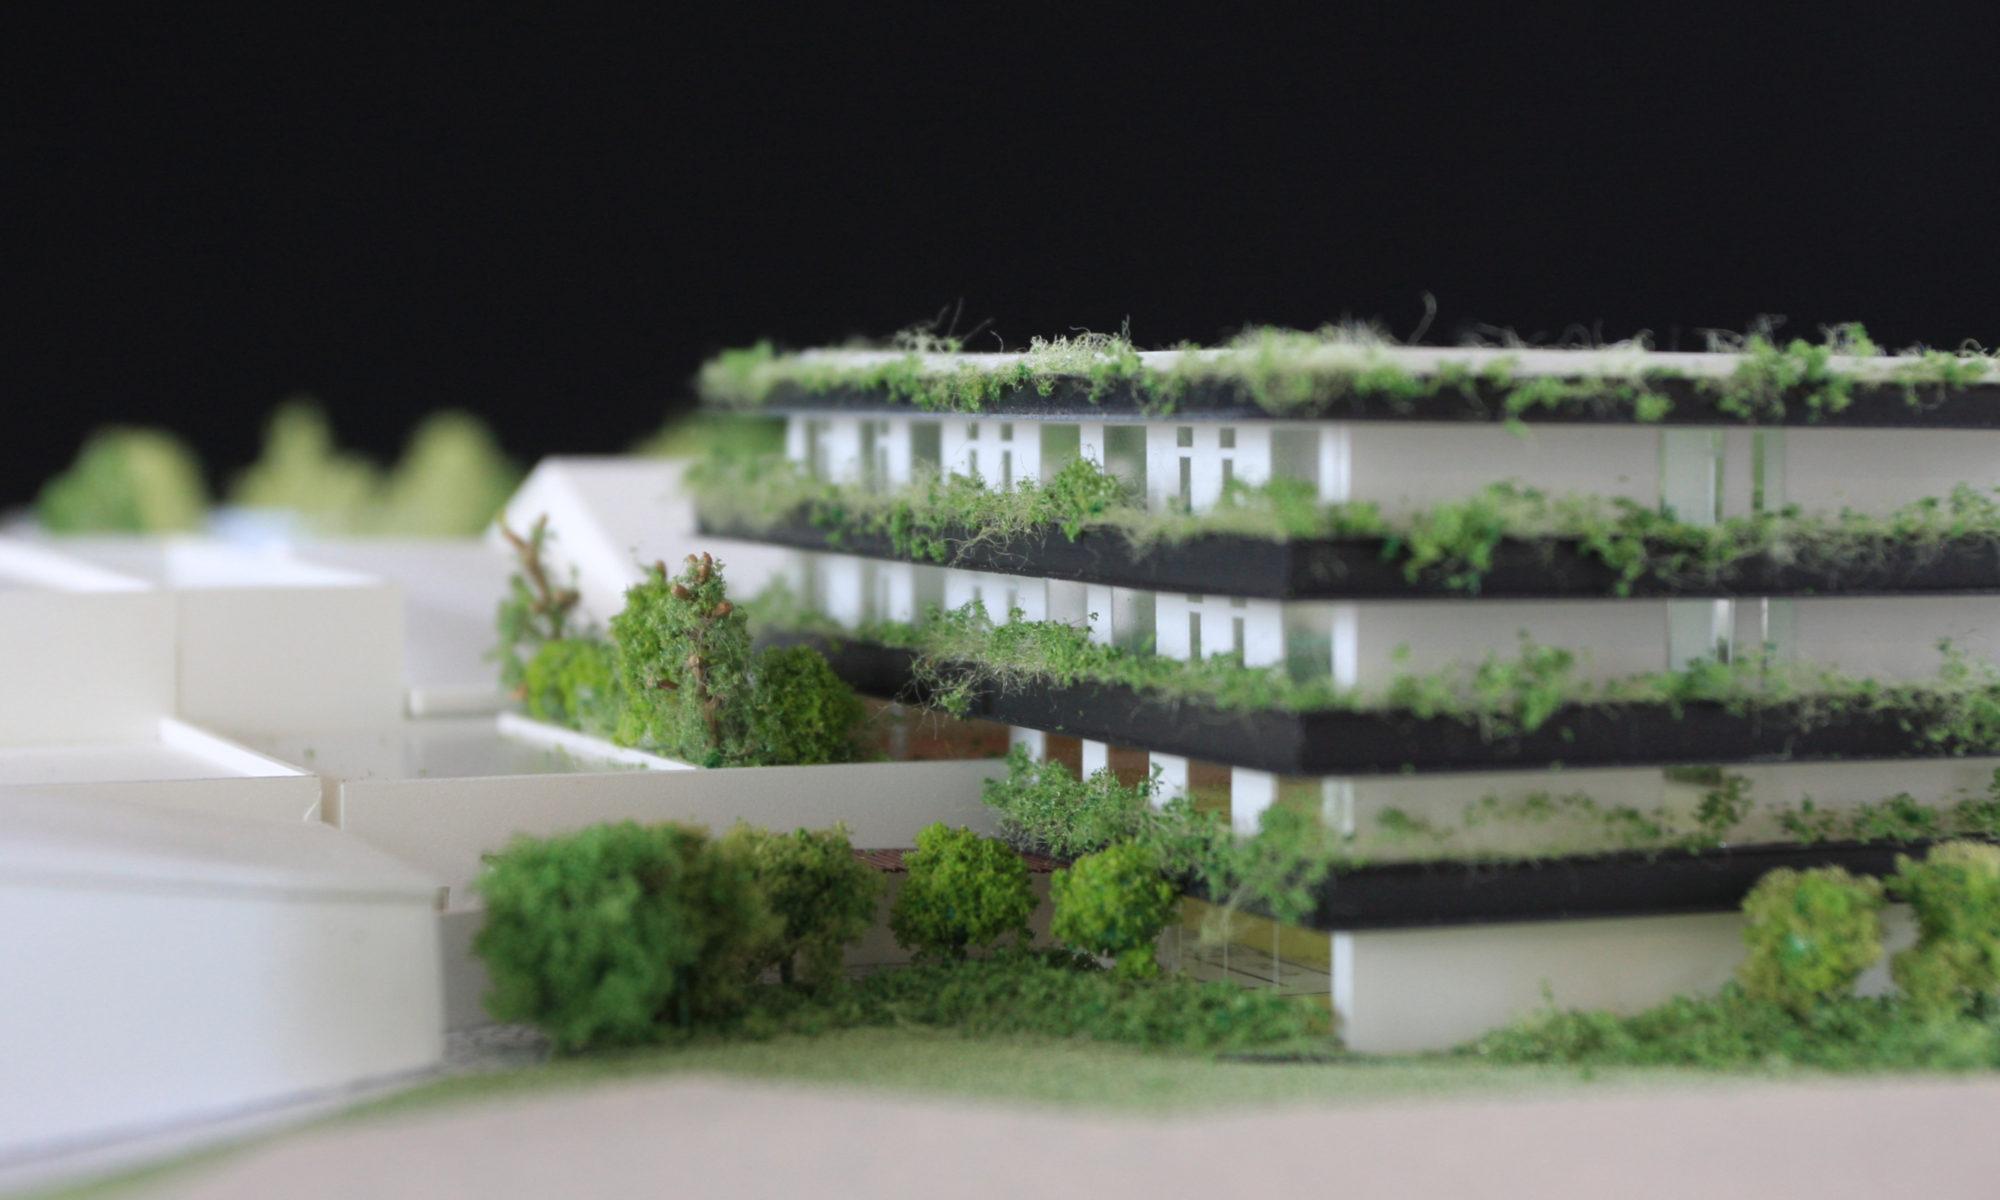 山本建築設計事務所 | yamamoto archi